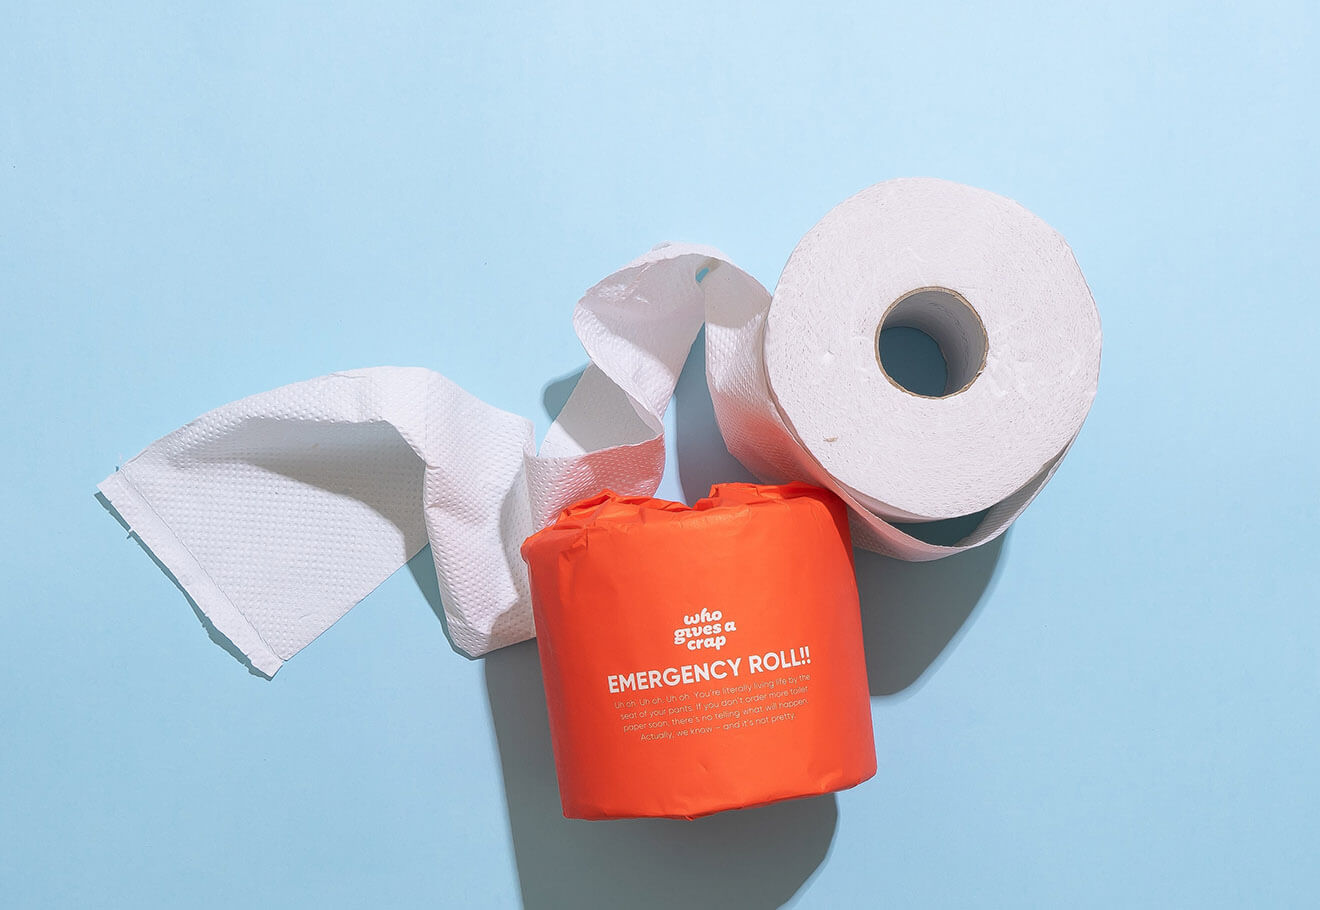 Plastic-free toilet paper roll